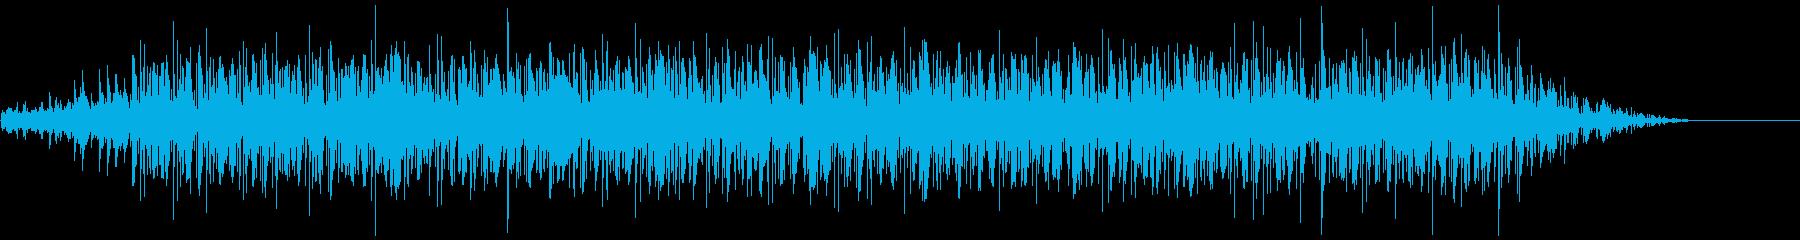 80sヴェイパー風ポップの再生済みの波形